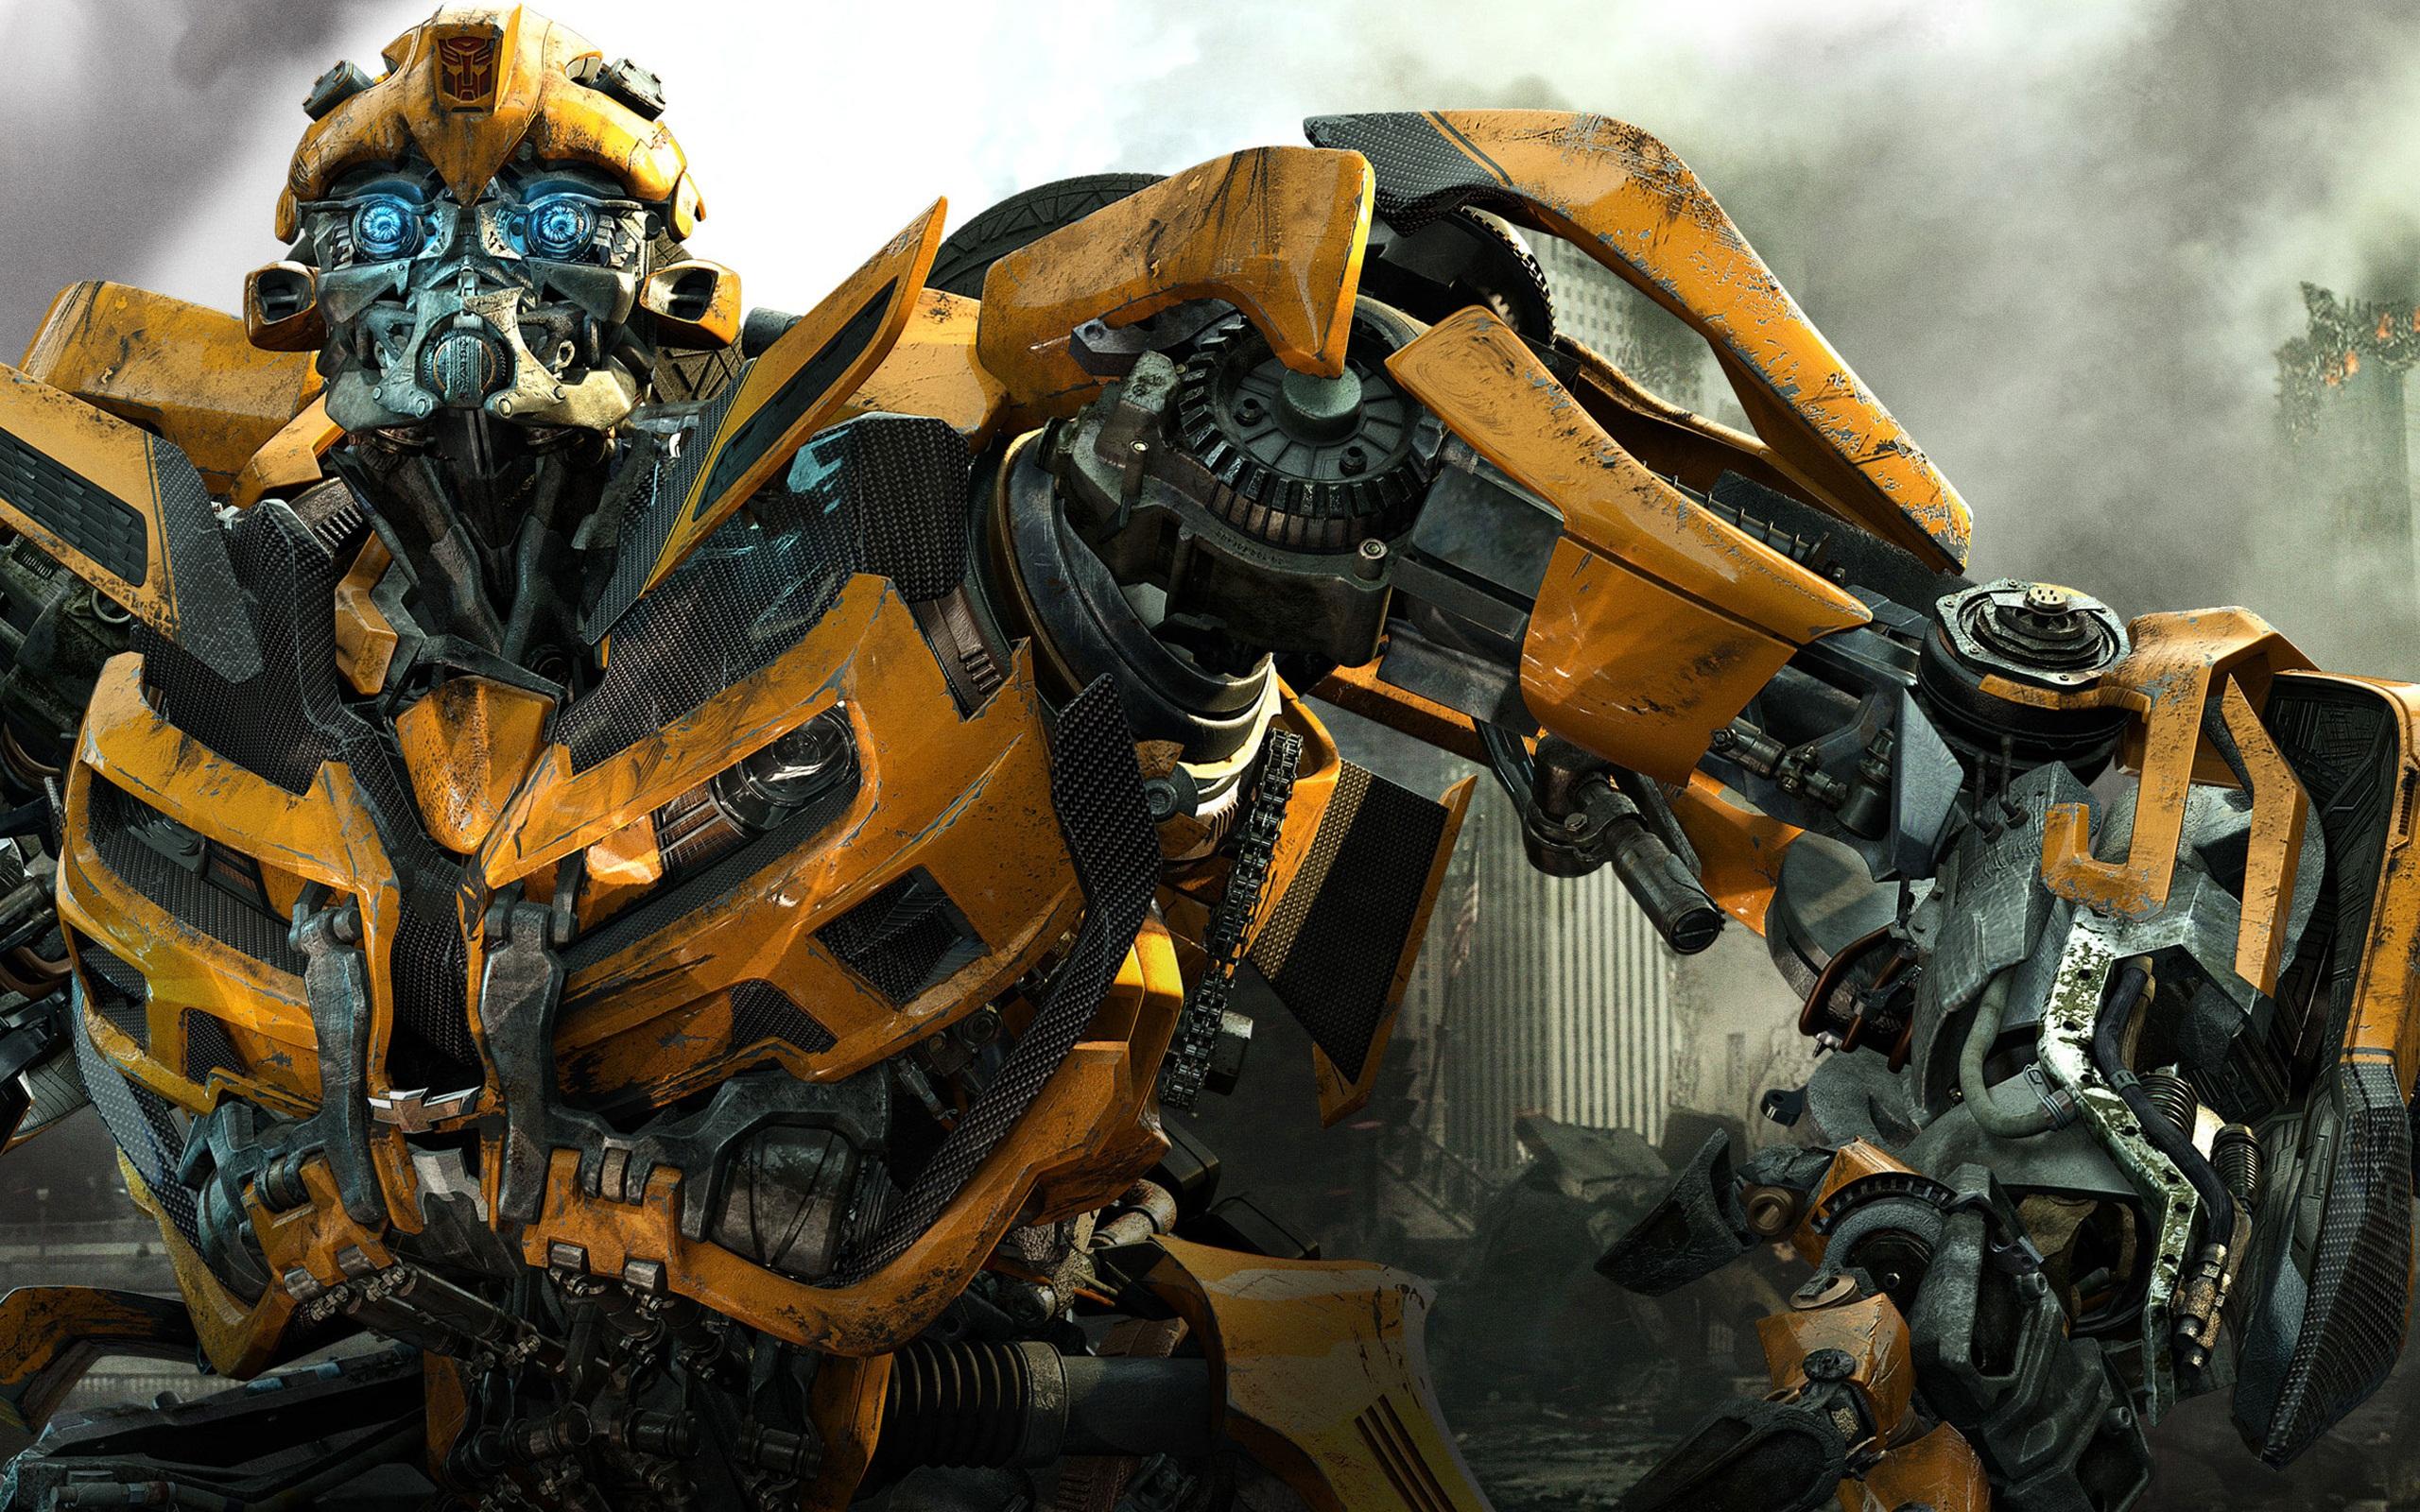 New Transformers Movie Wallpapers Full HD ImageBankbiz 2560x1600